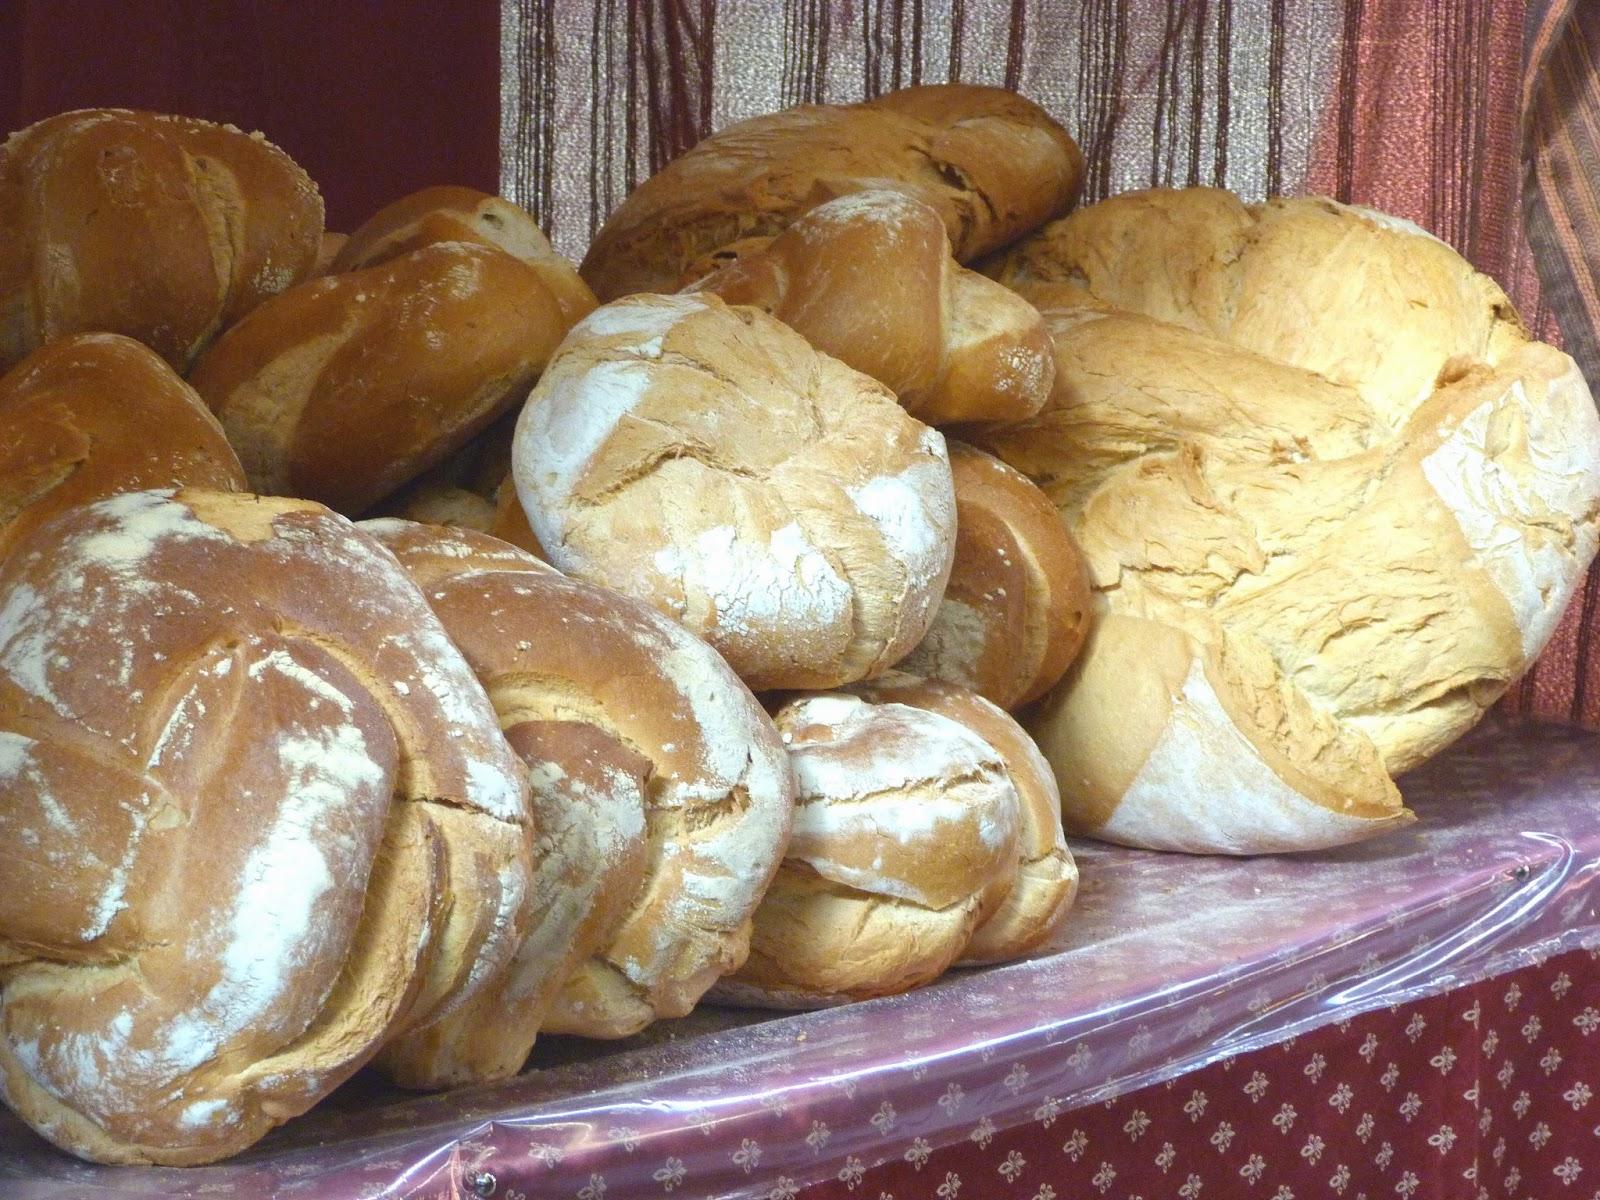 Tarragonain panes tradicionales